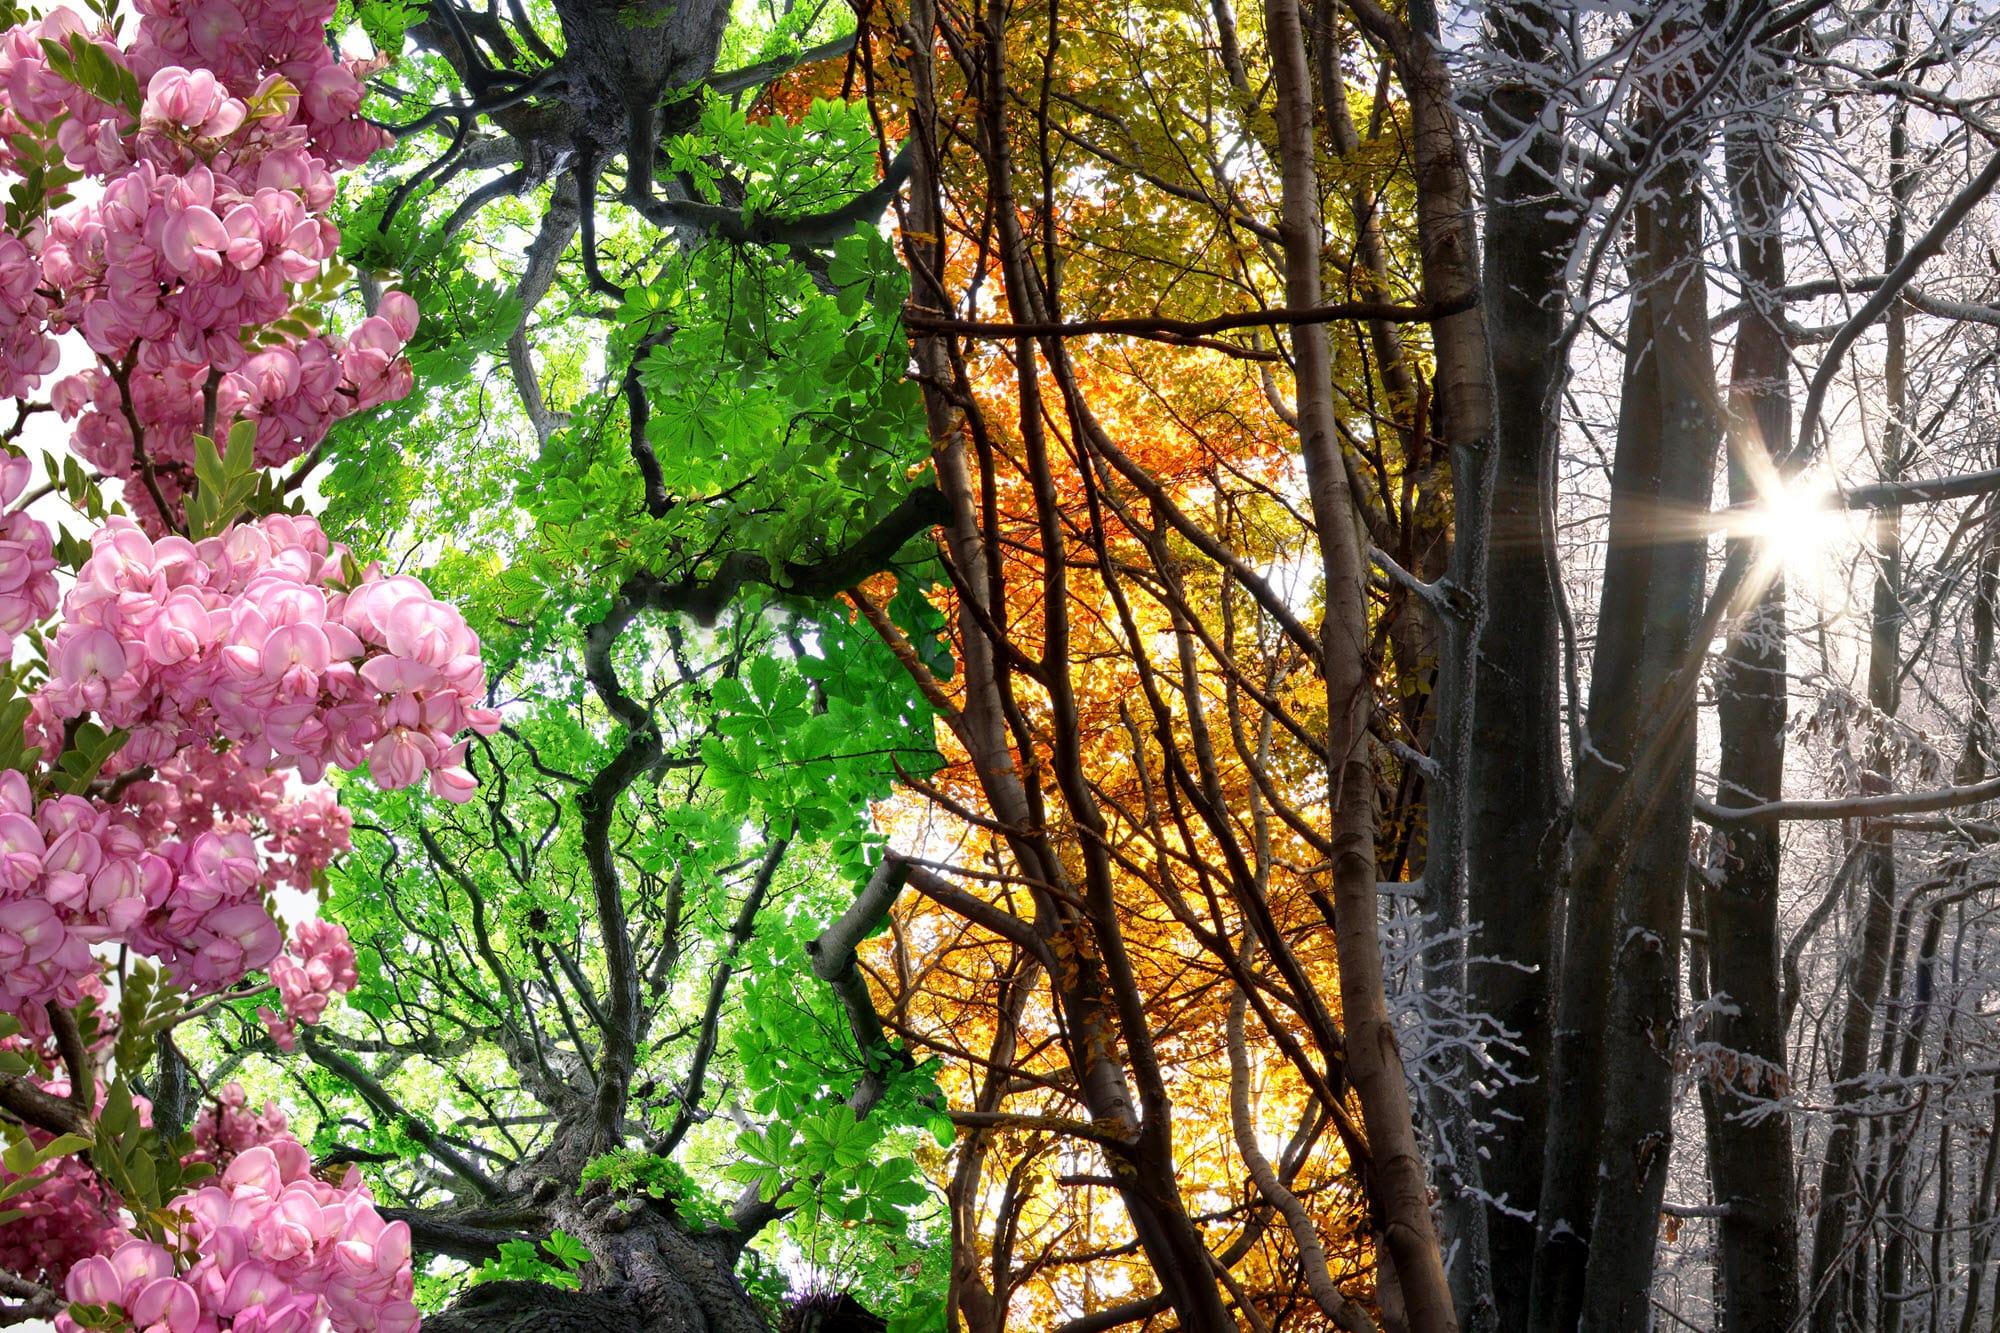 Image of nature highlighting seasonal changes.